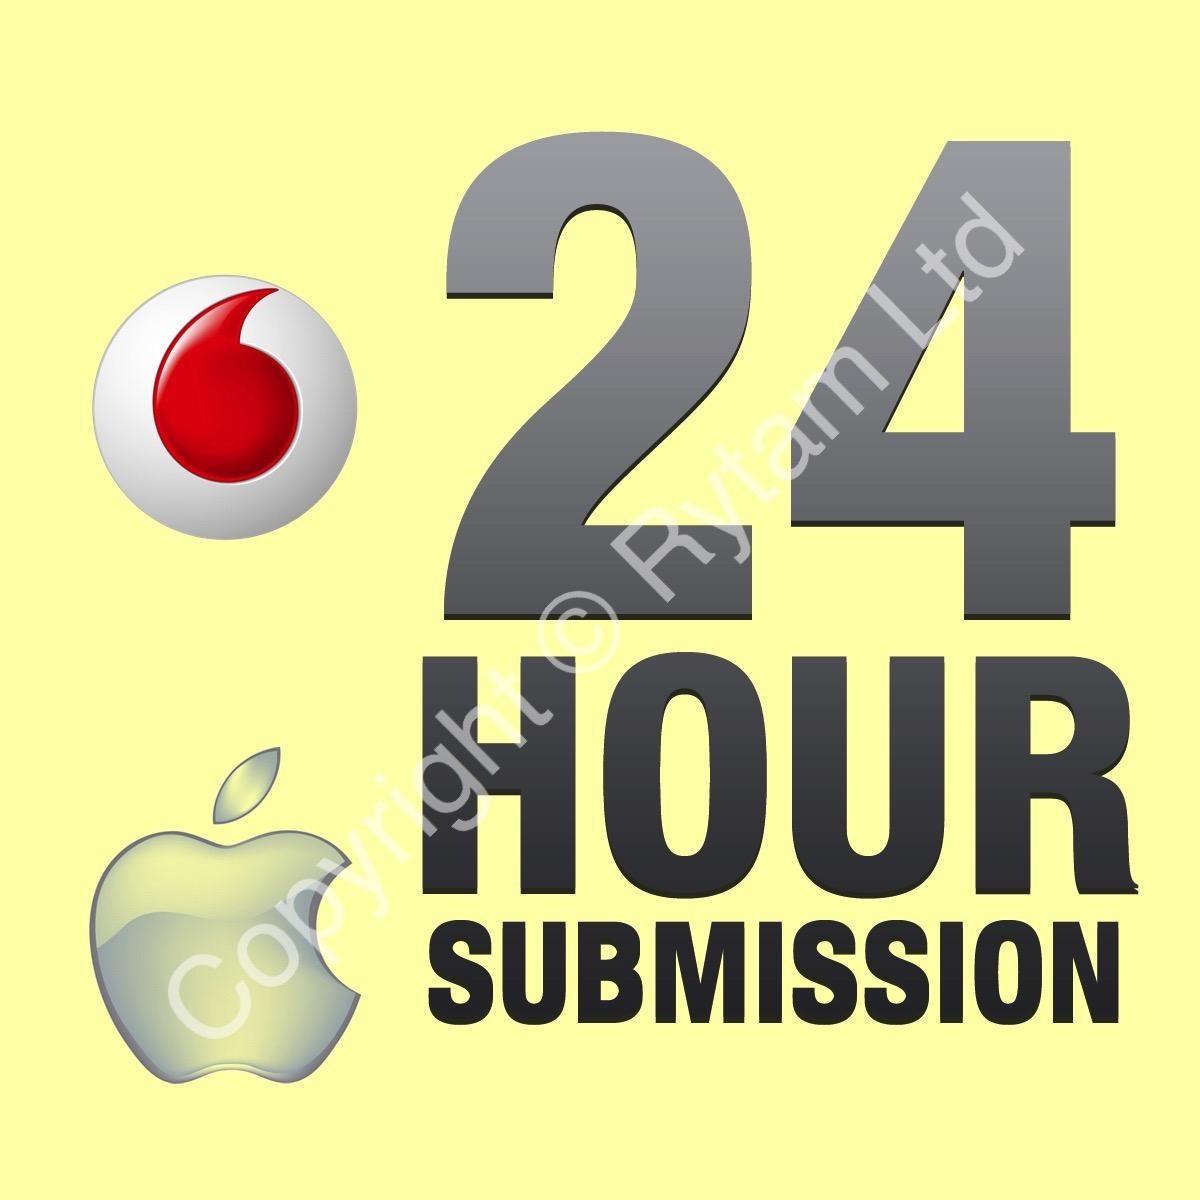 Vodafone UK - Apple iPhone 3G / 4 / 4S / 5 / 5C / 5S / 6 Unlock Service